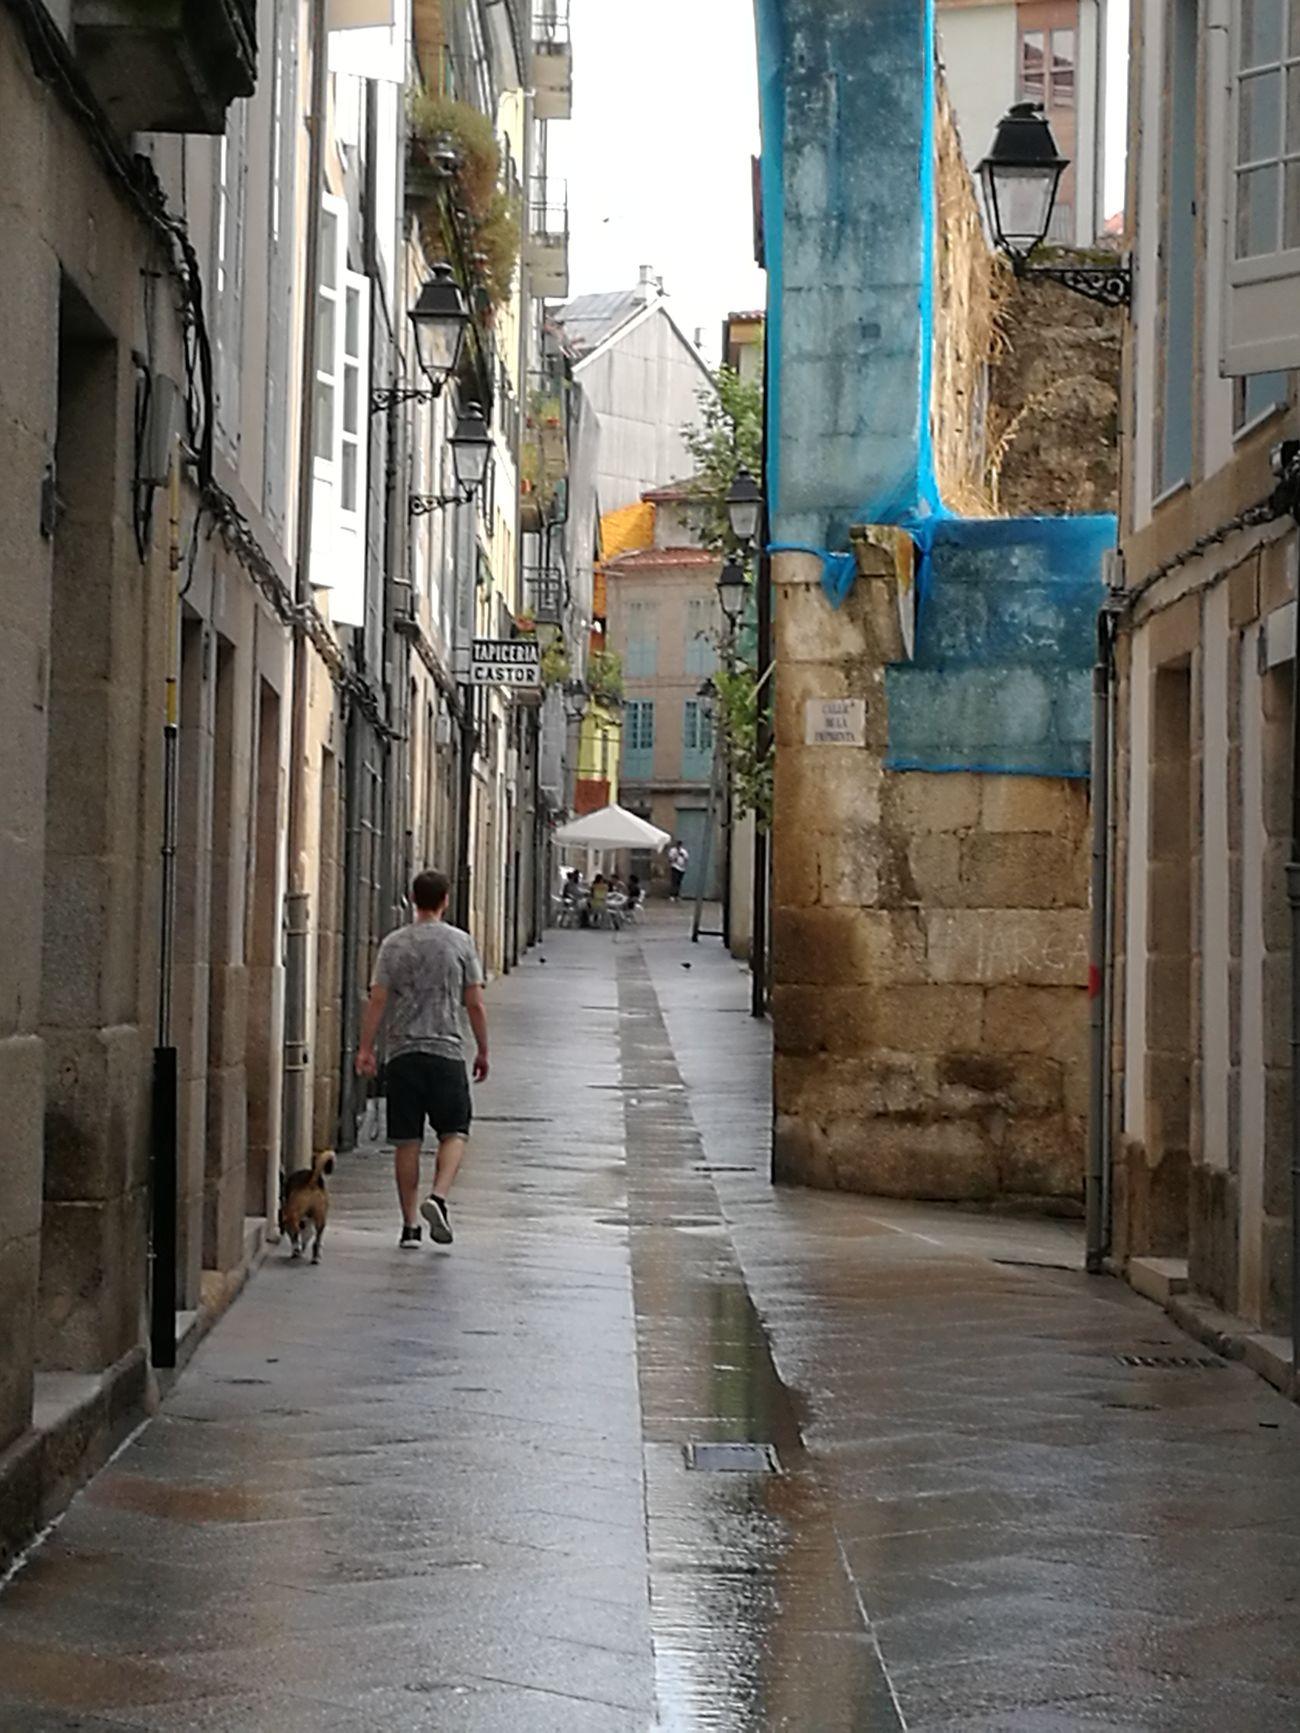 Caminante no hay camino. Streetphotography Reflejos Huawei P9.Dia Gris